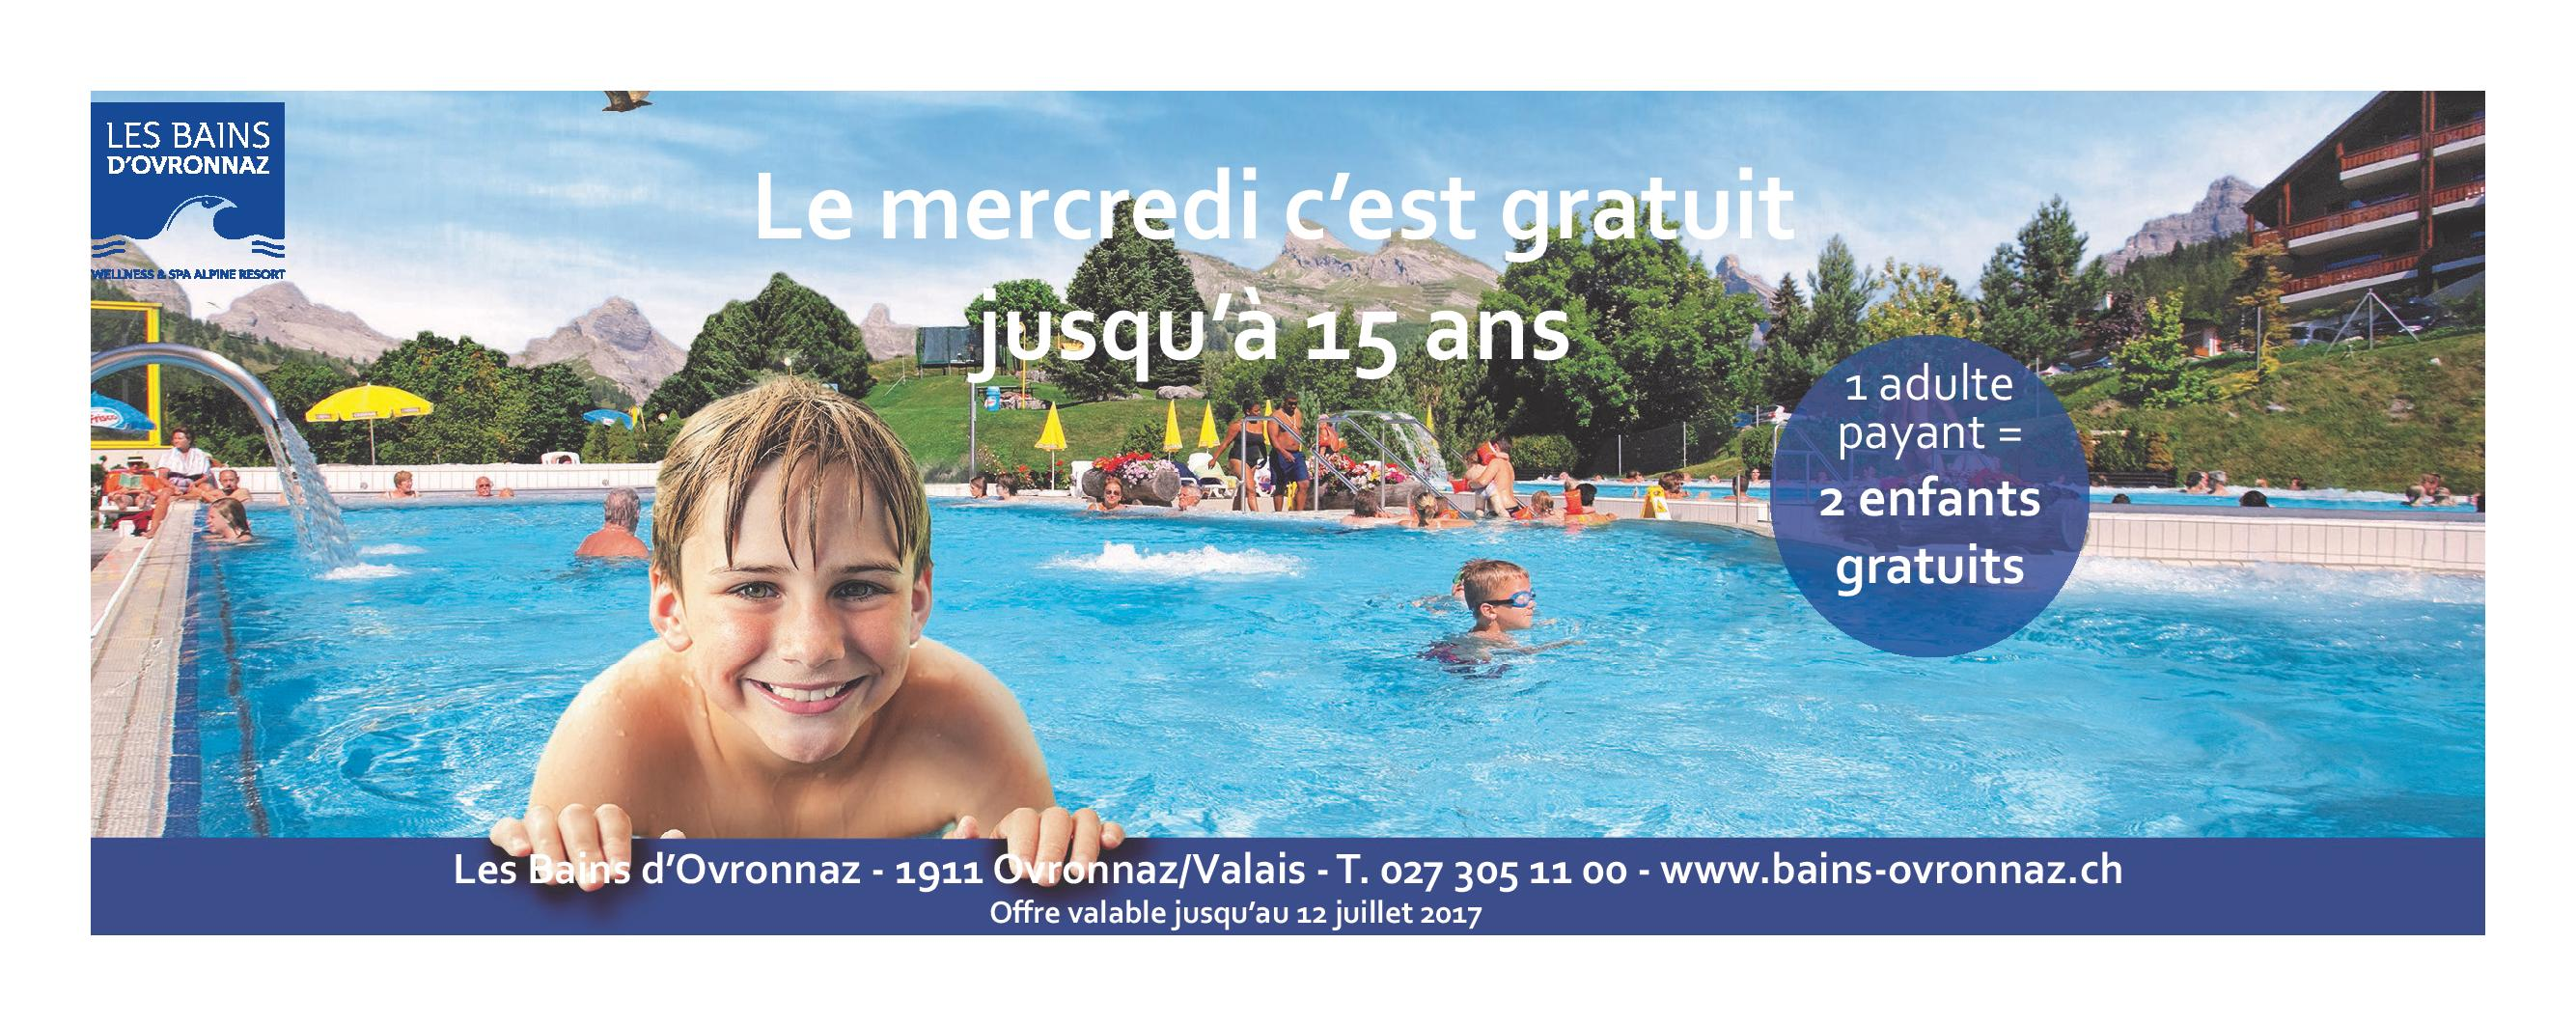 2017_10X74-Mercredis-gratuits-page-001